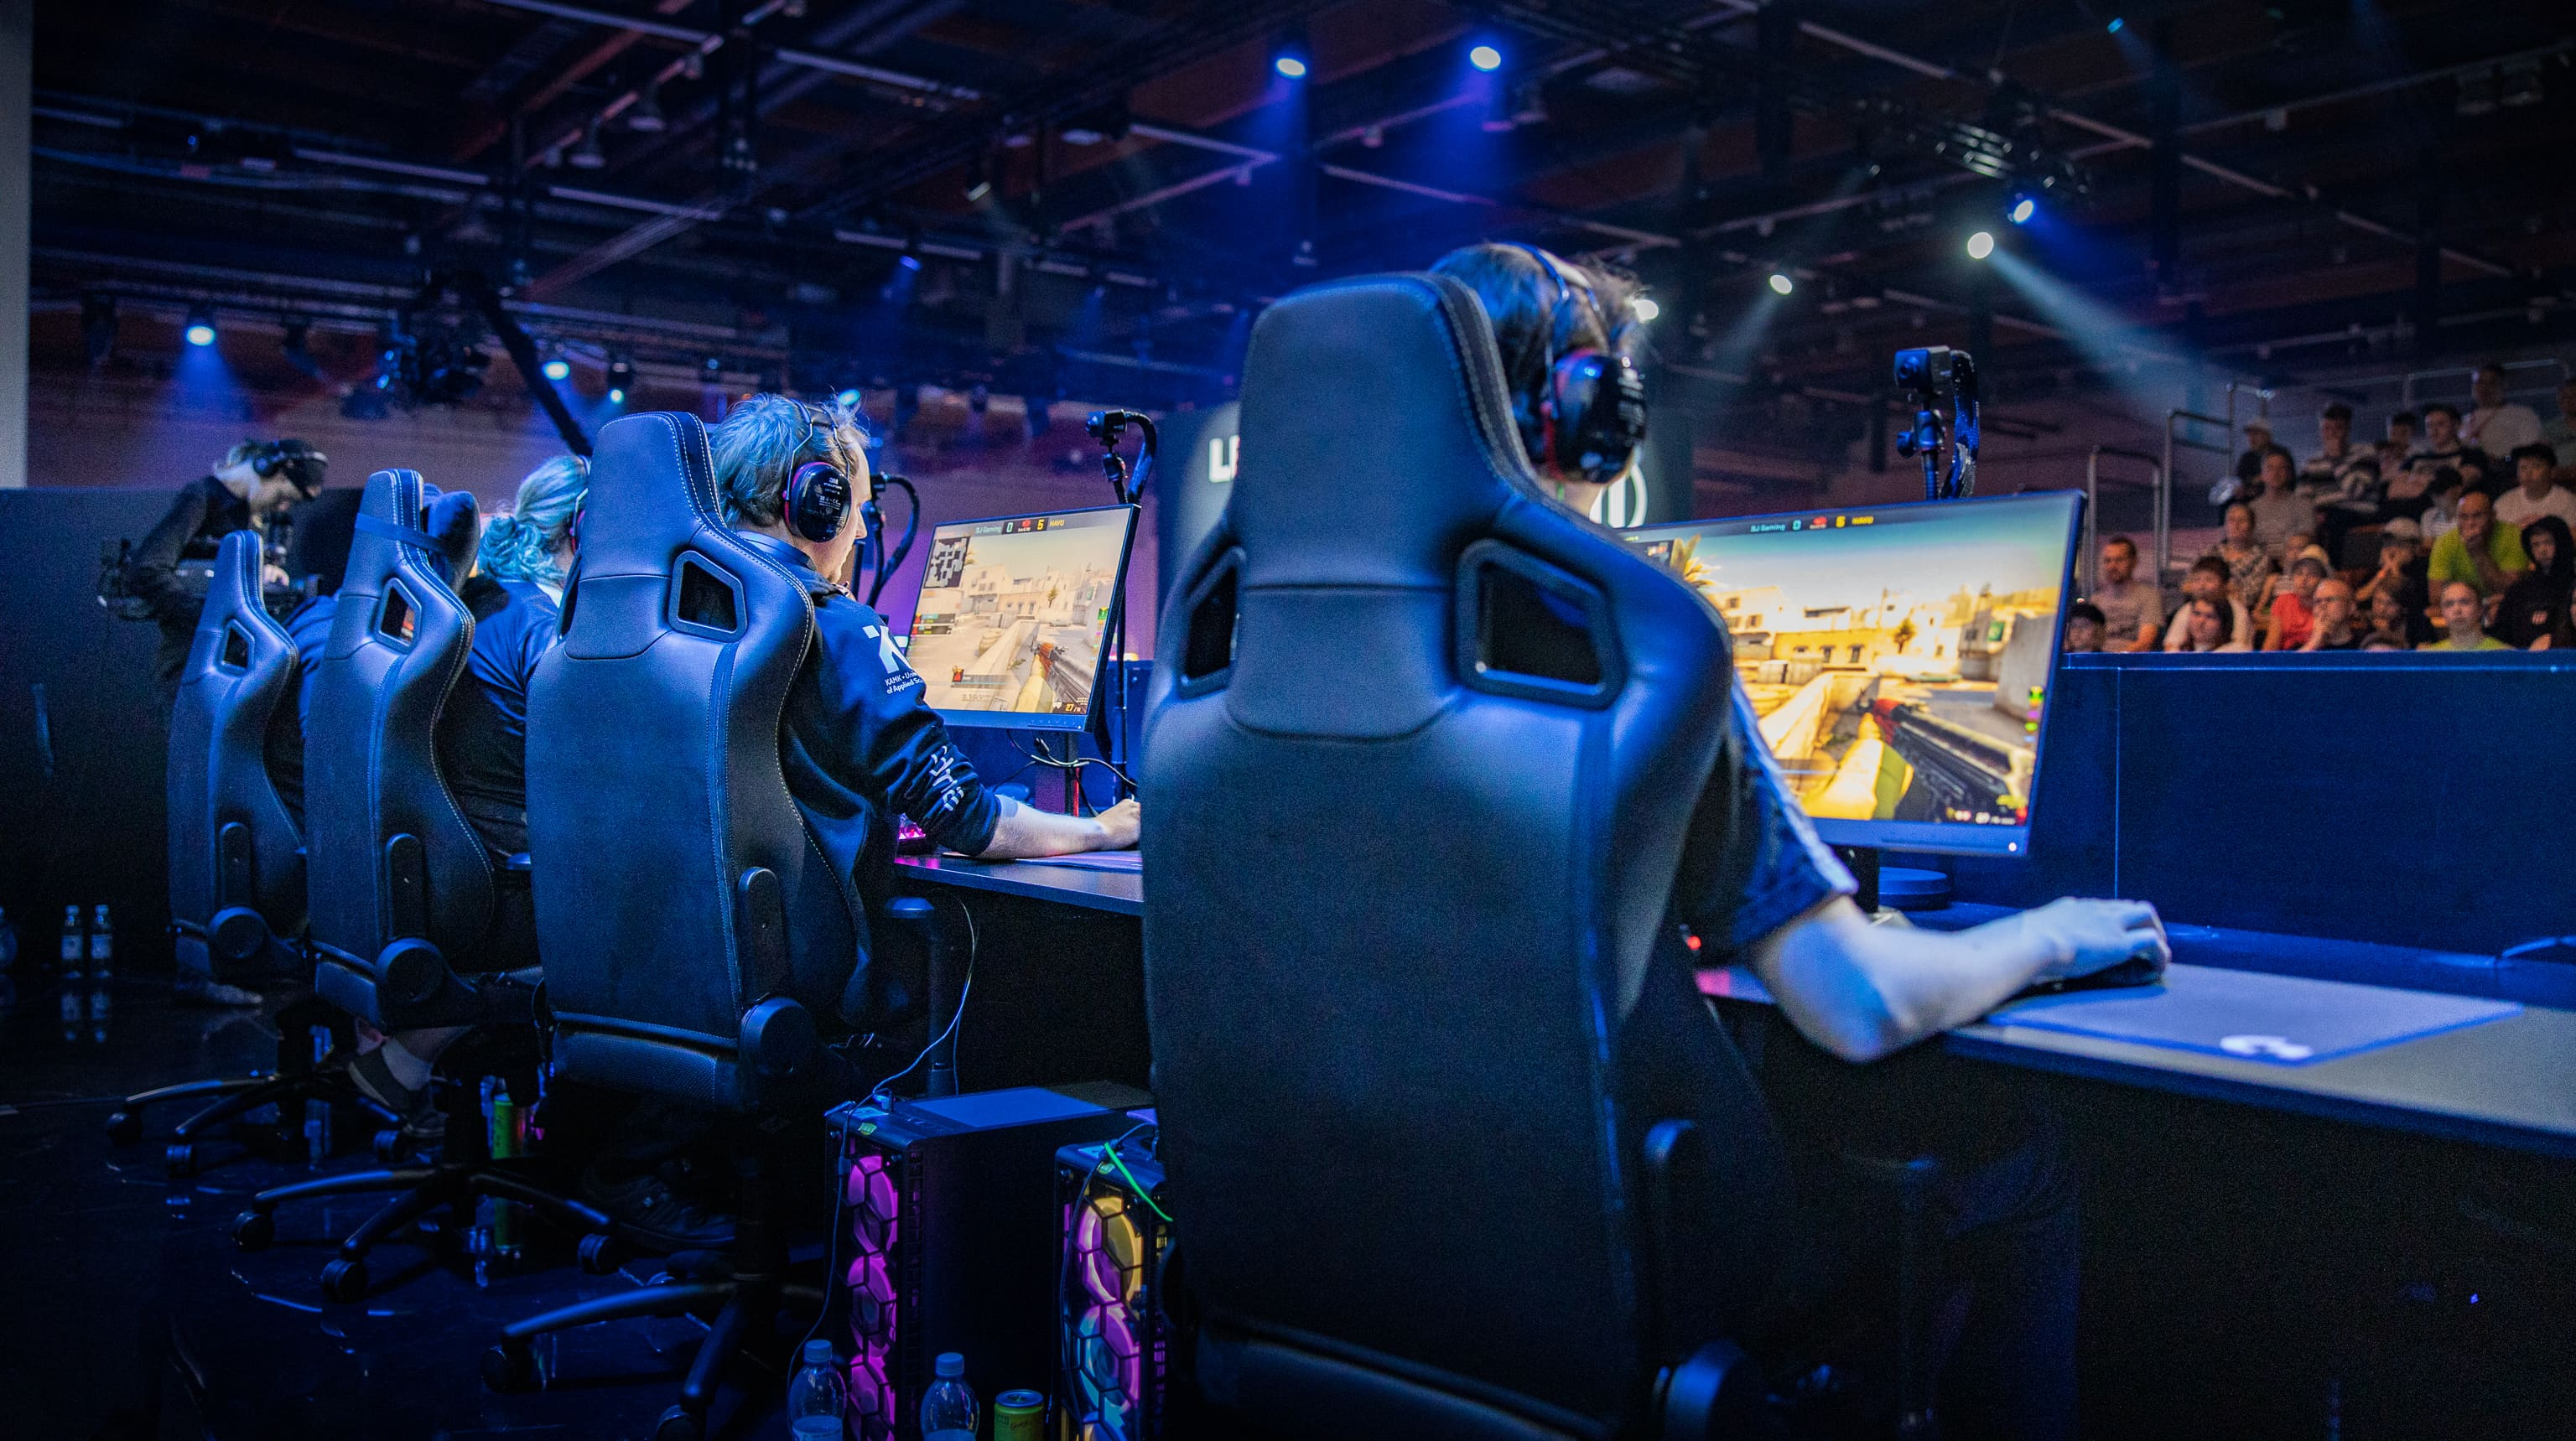 SJ Gaminging CS:GO joukkue pelaamassa.